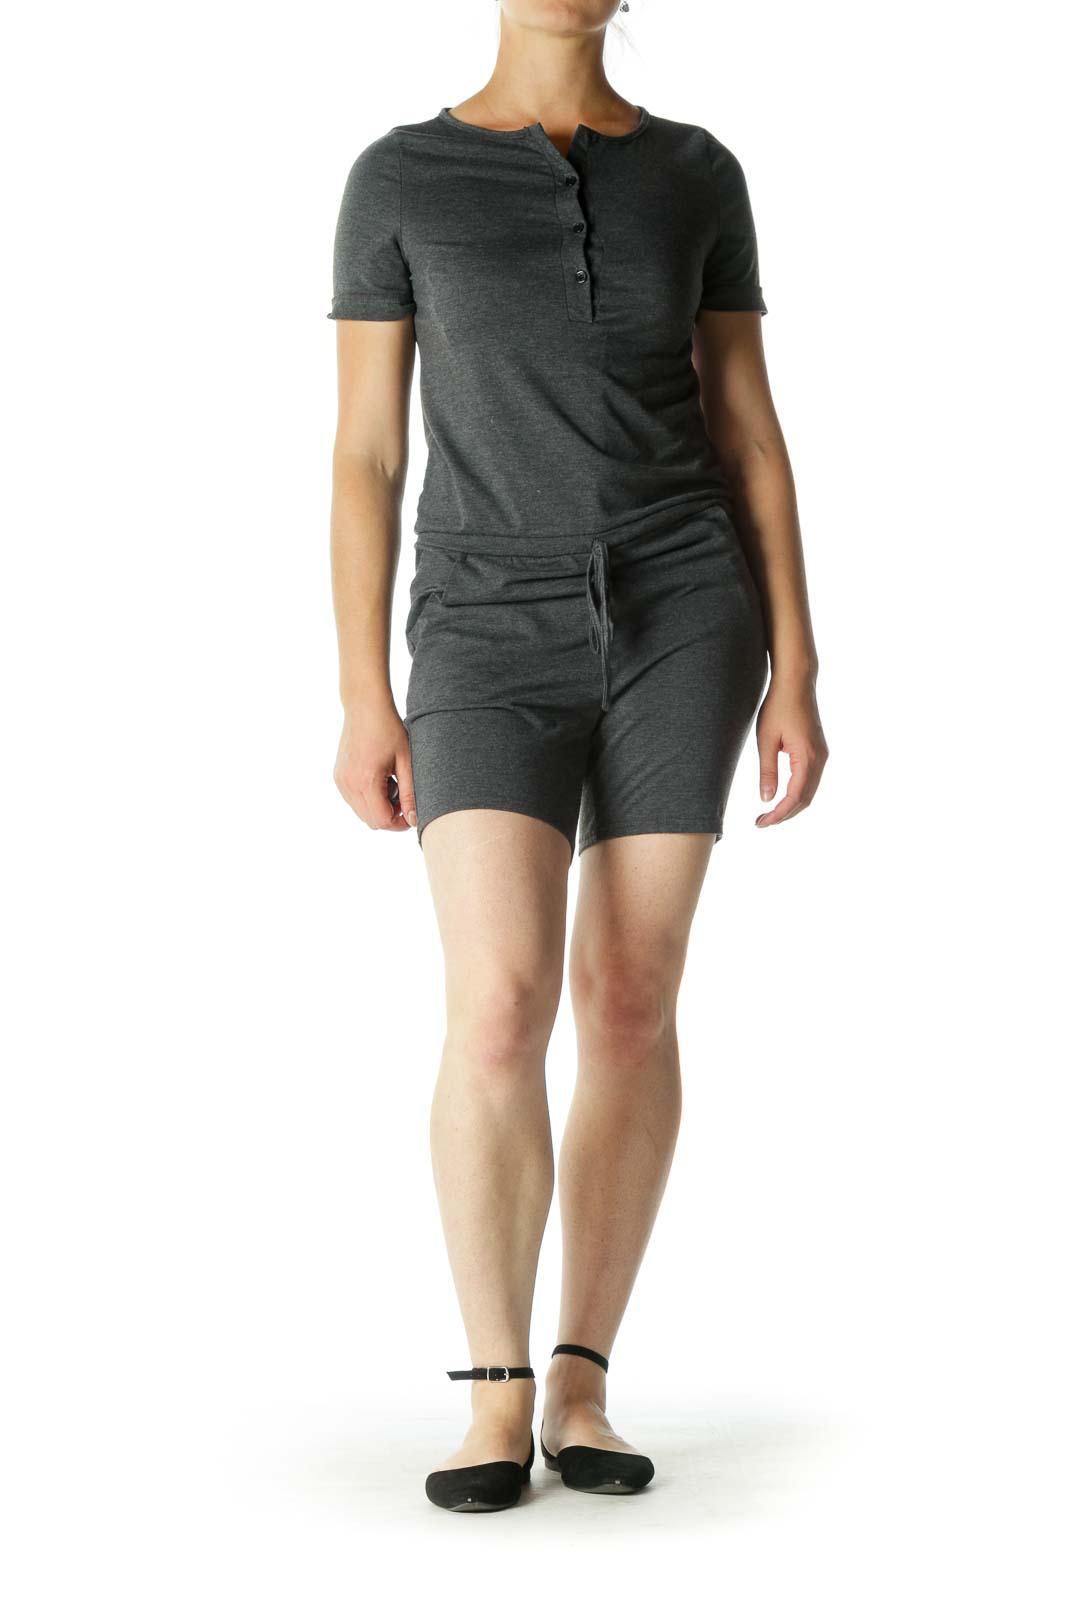 Gray Short Sleeve Romper